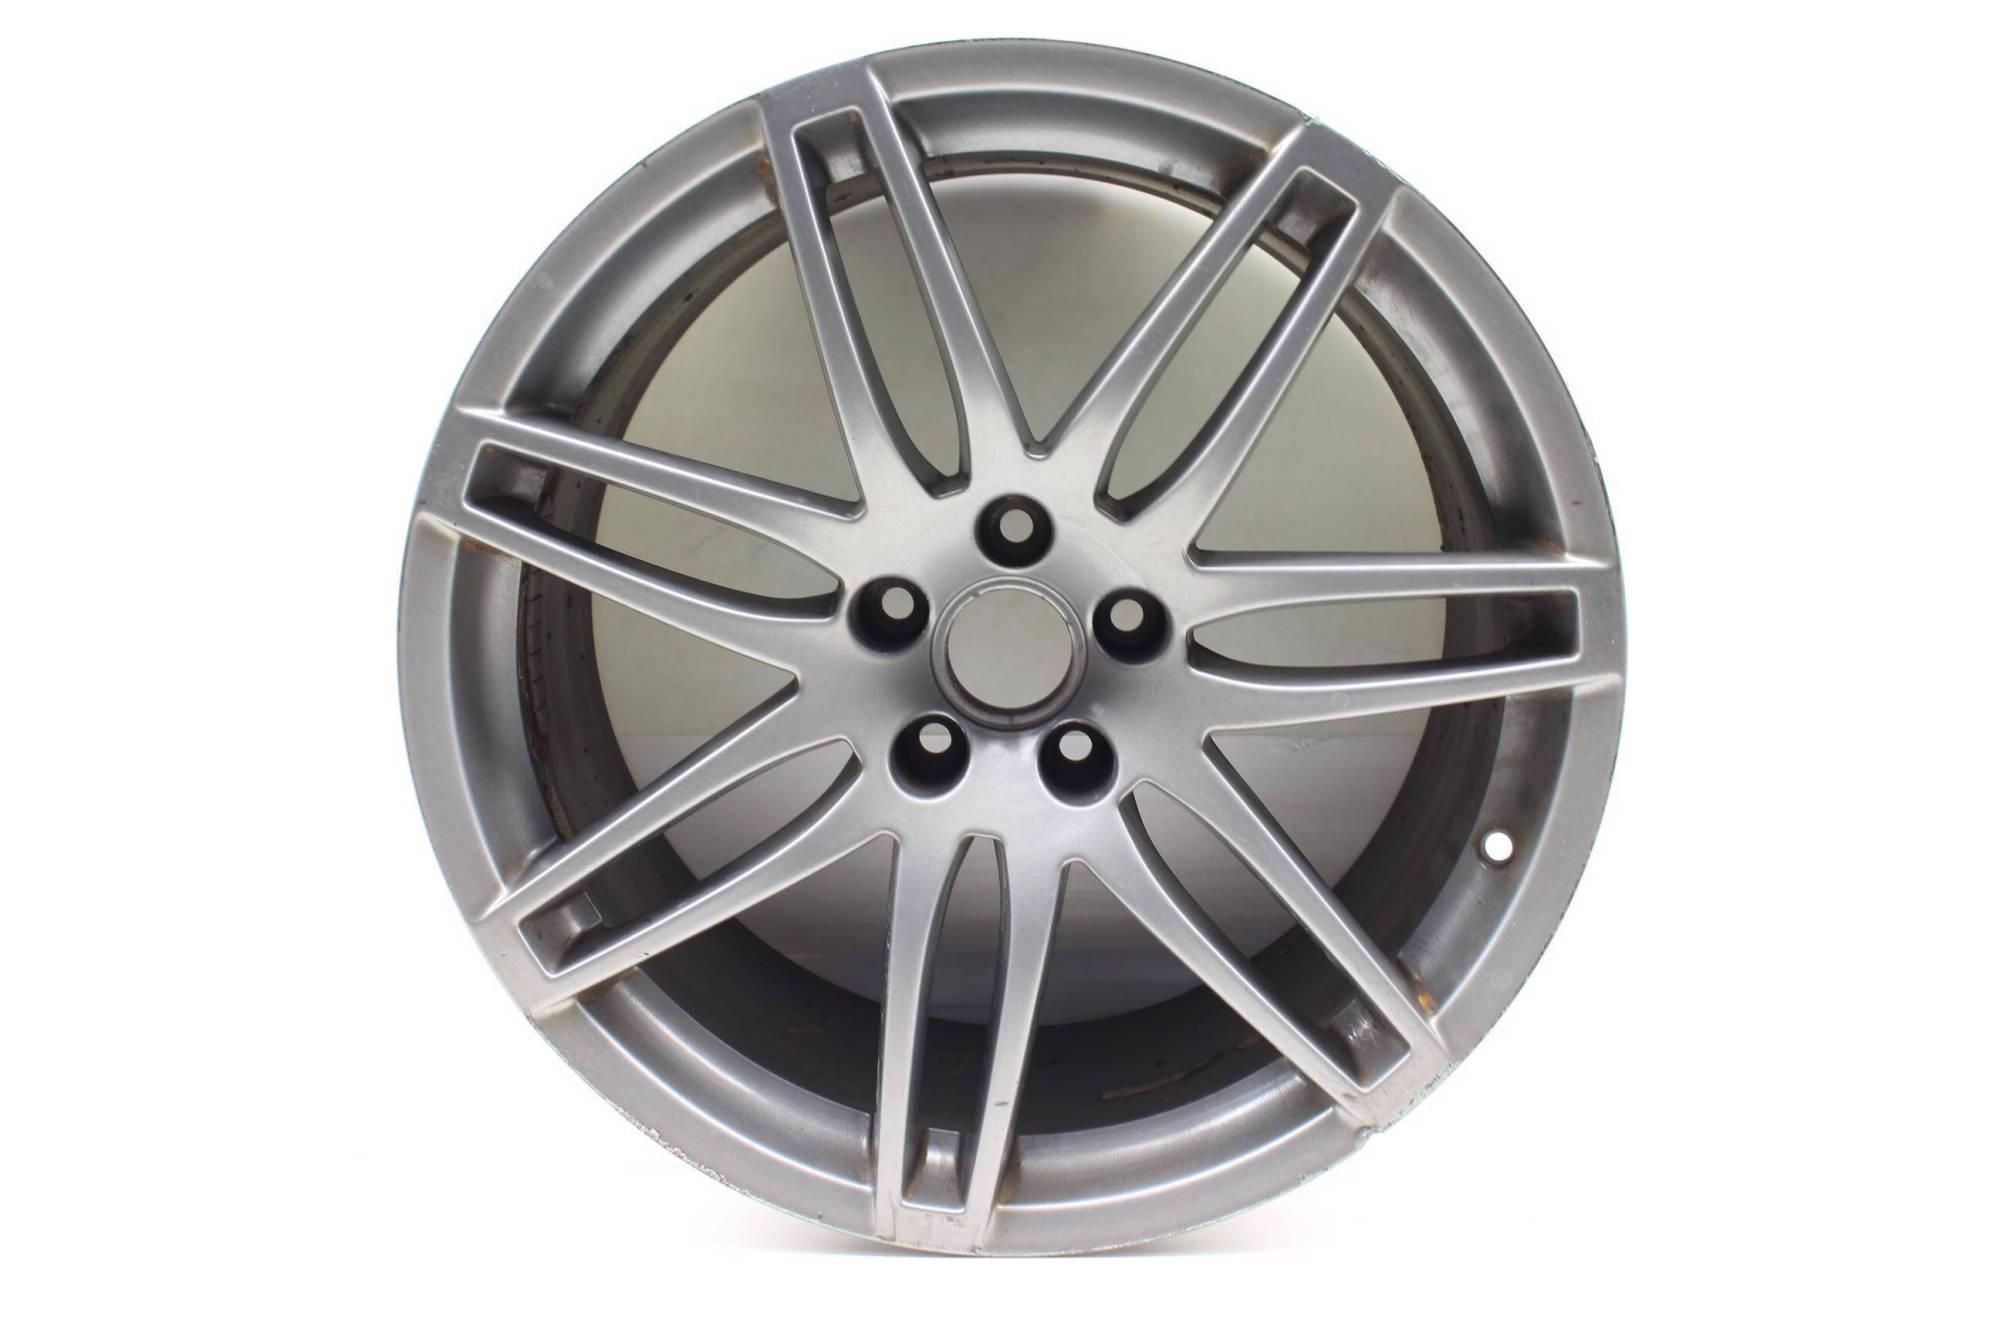 hight resolution of 2007 2008 audi rs4 b7 4 2l 19 inch alloy rim wheel